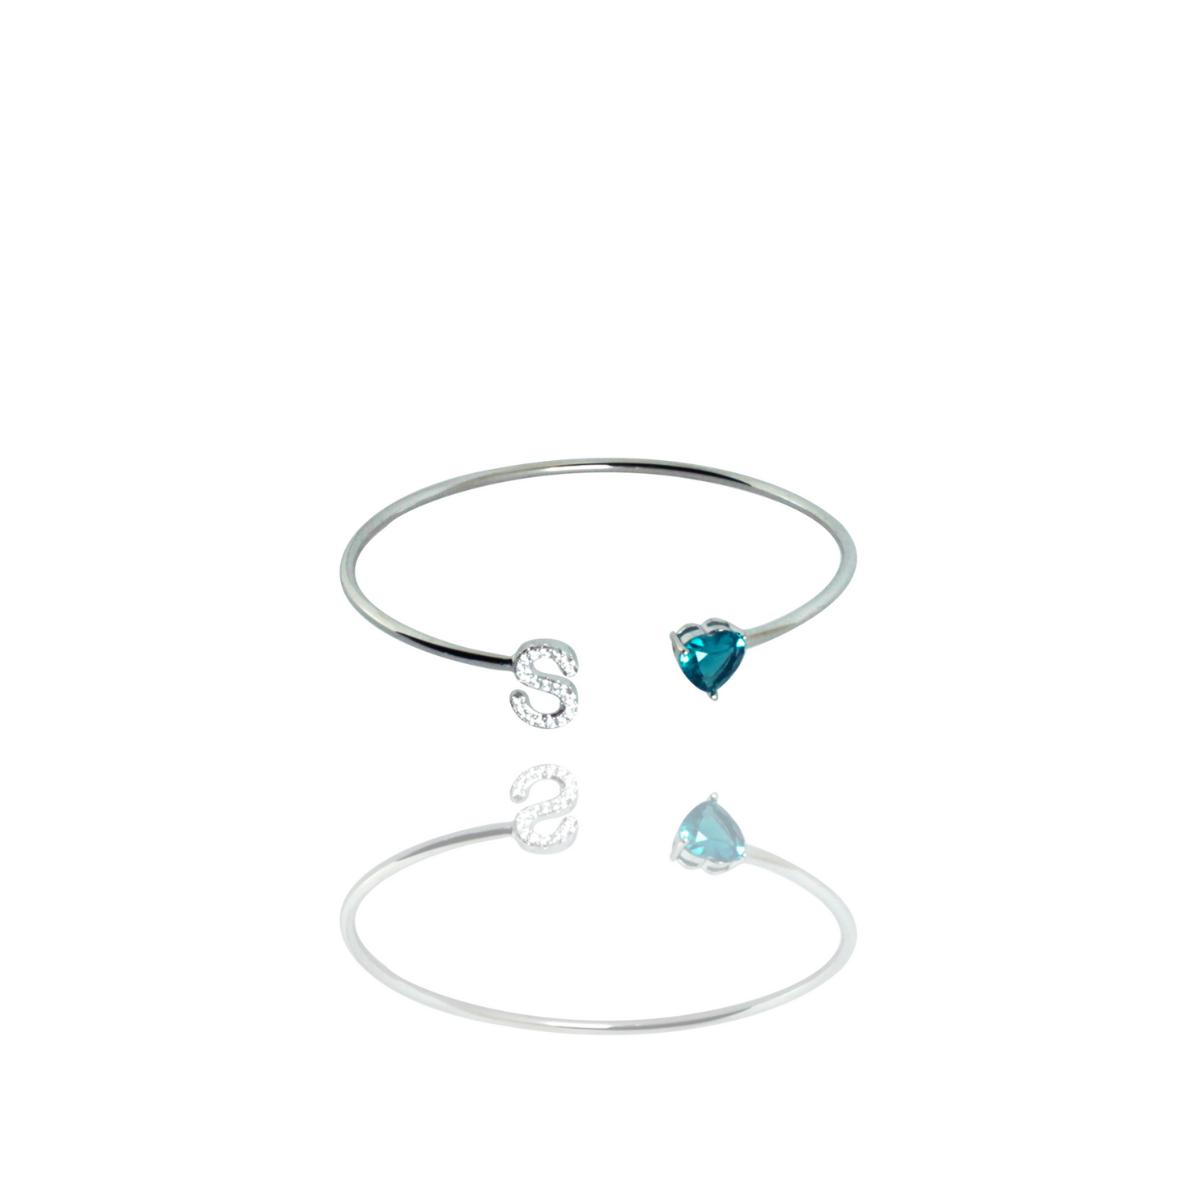 Bracelete Barbara Strauss Semi Joia Love S Em Quartzo Azul, Rev. Ouro Branco 18K